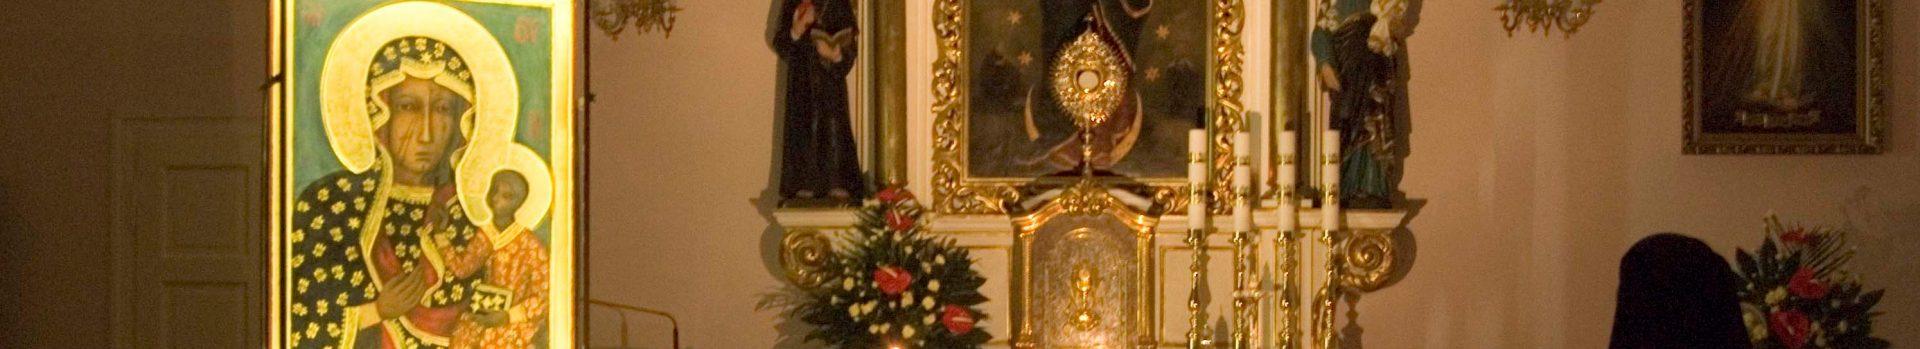 Zgromadzenie Sióstr Augustianek